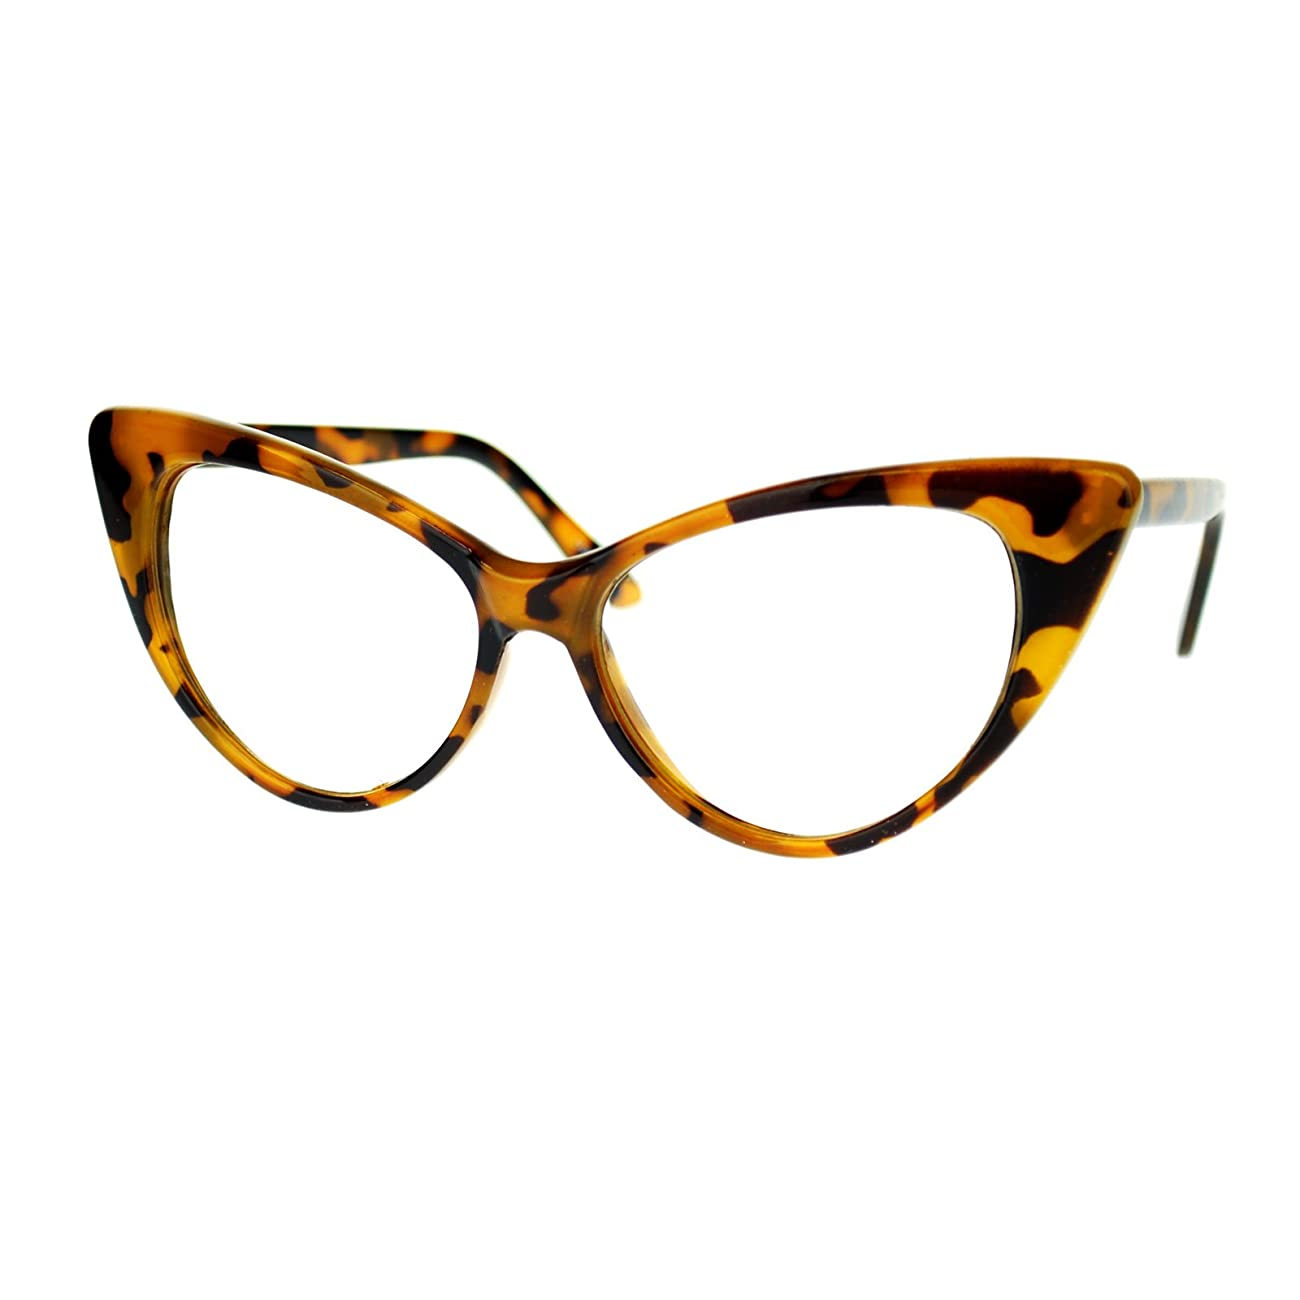 Womens Goth Mod Chic Classic Retro Cat Eye Optical Glasses 1